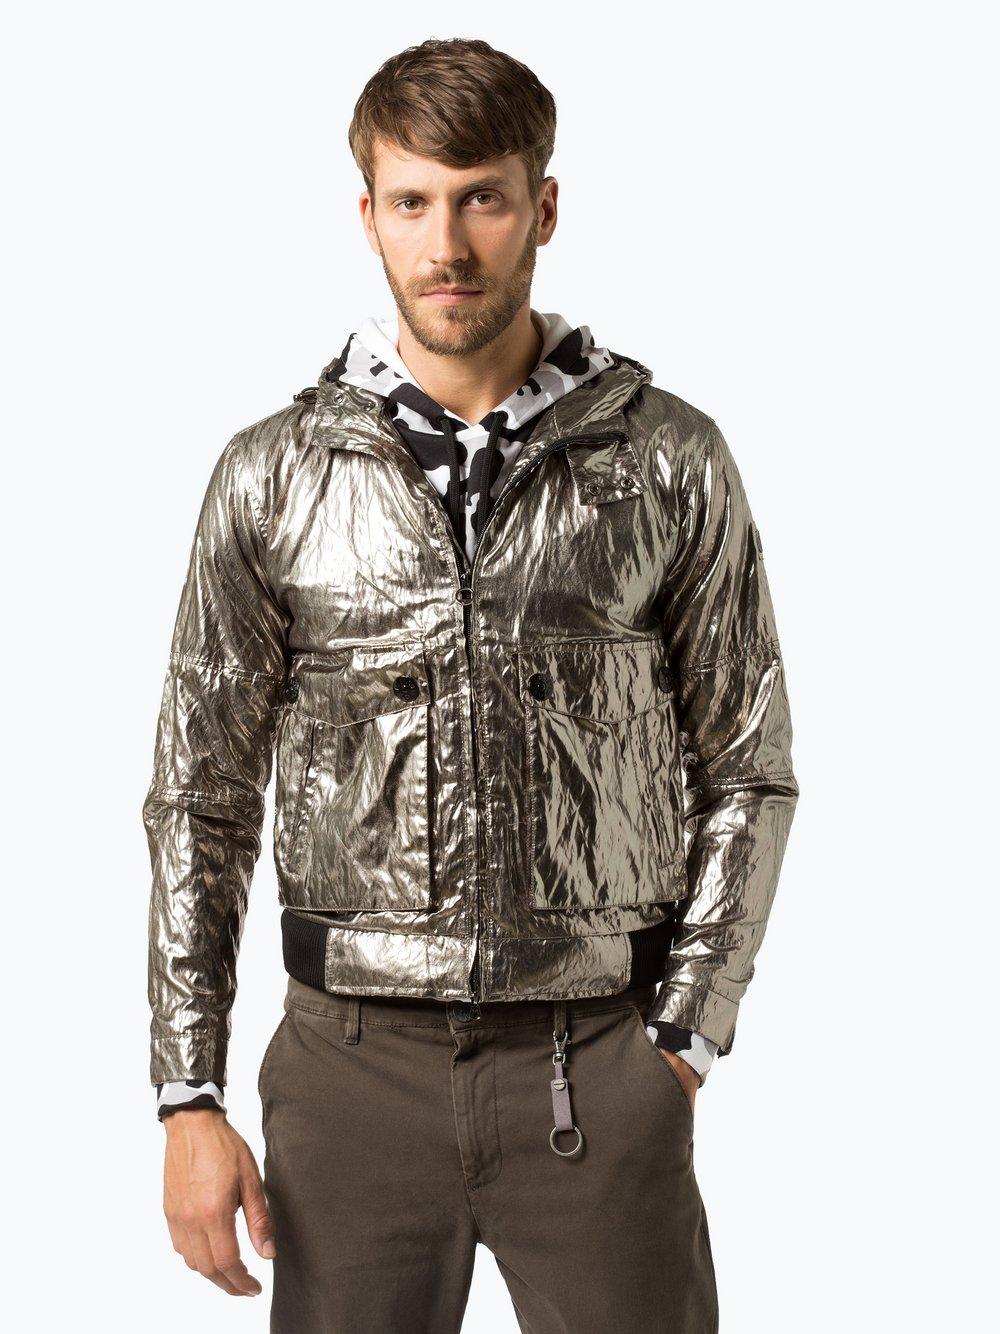 futurystyczna kurtka męska